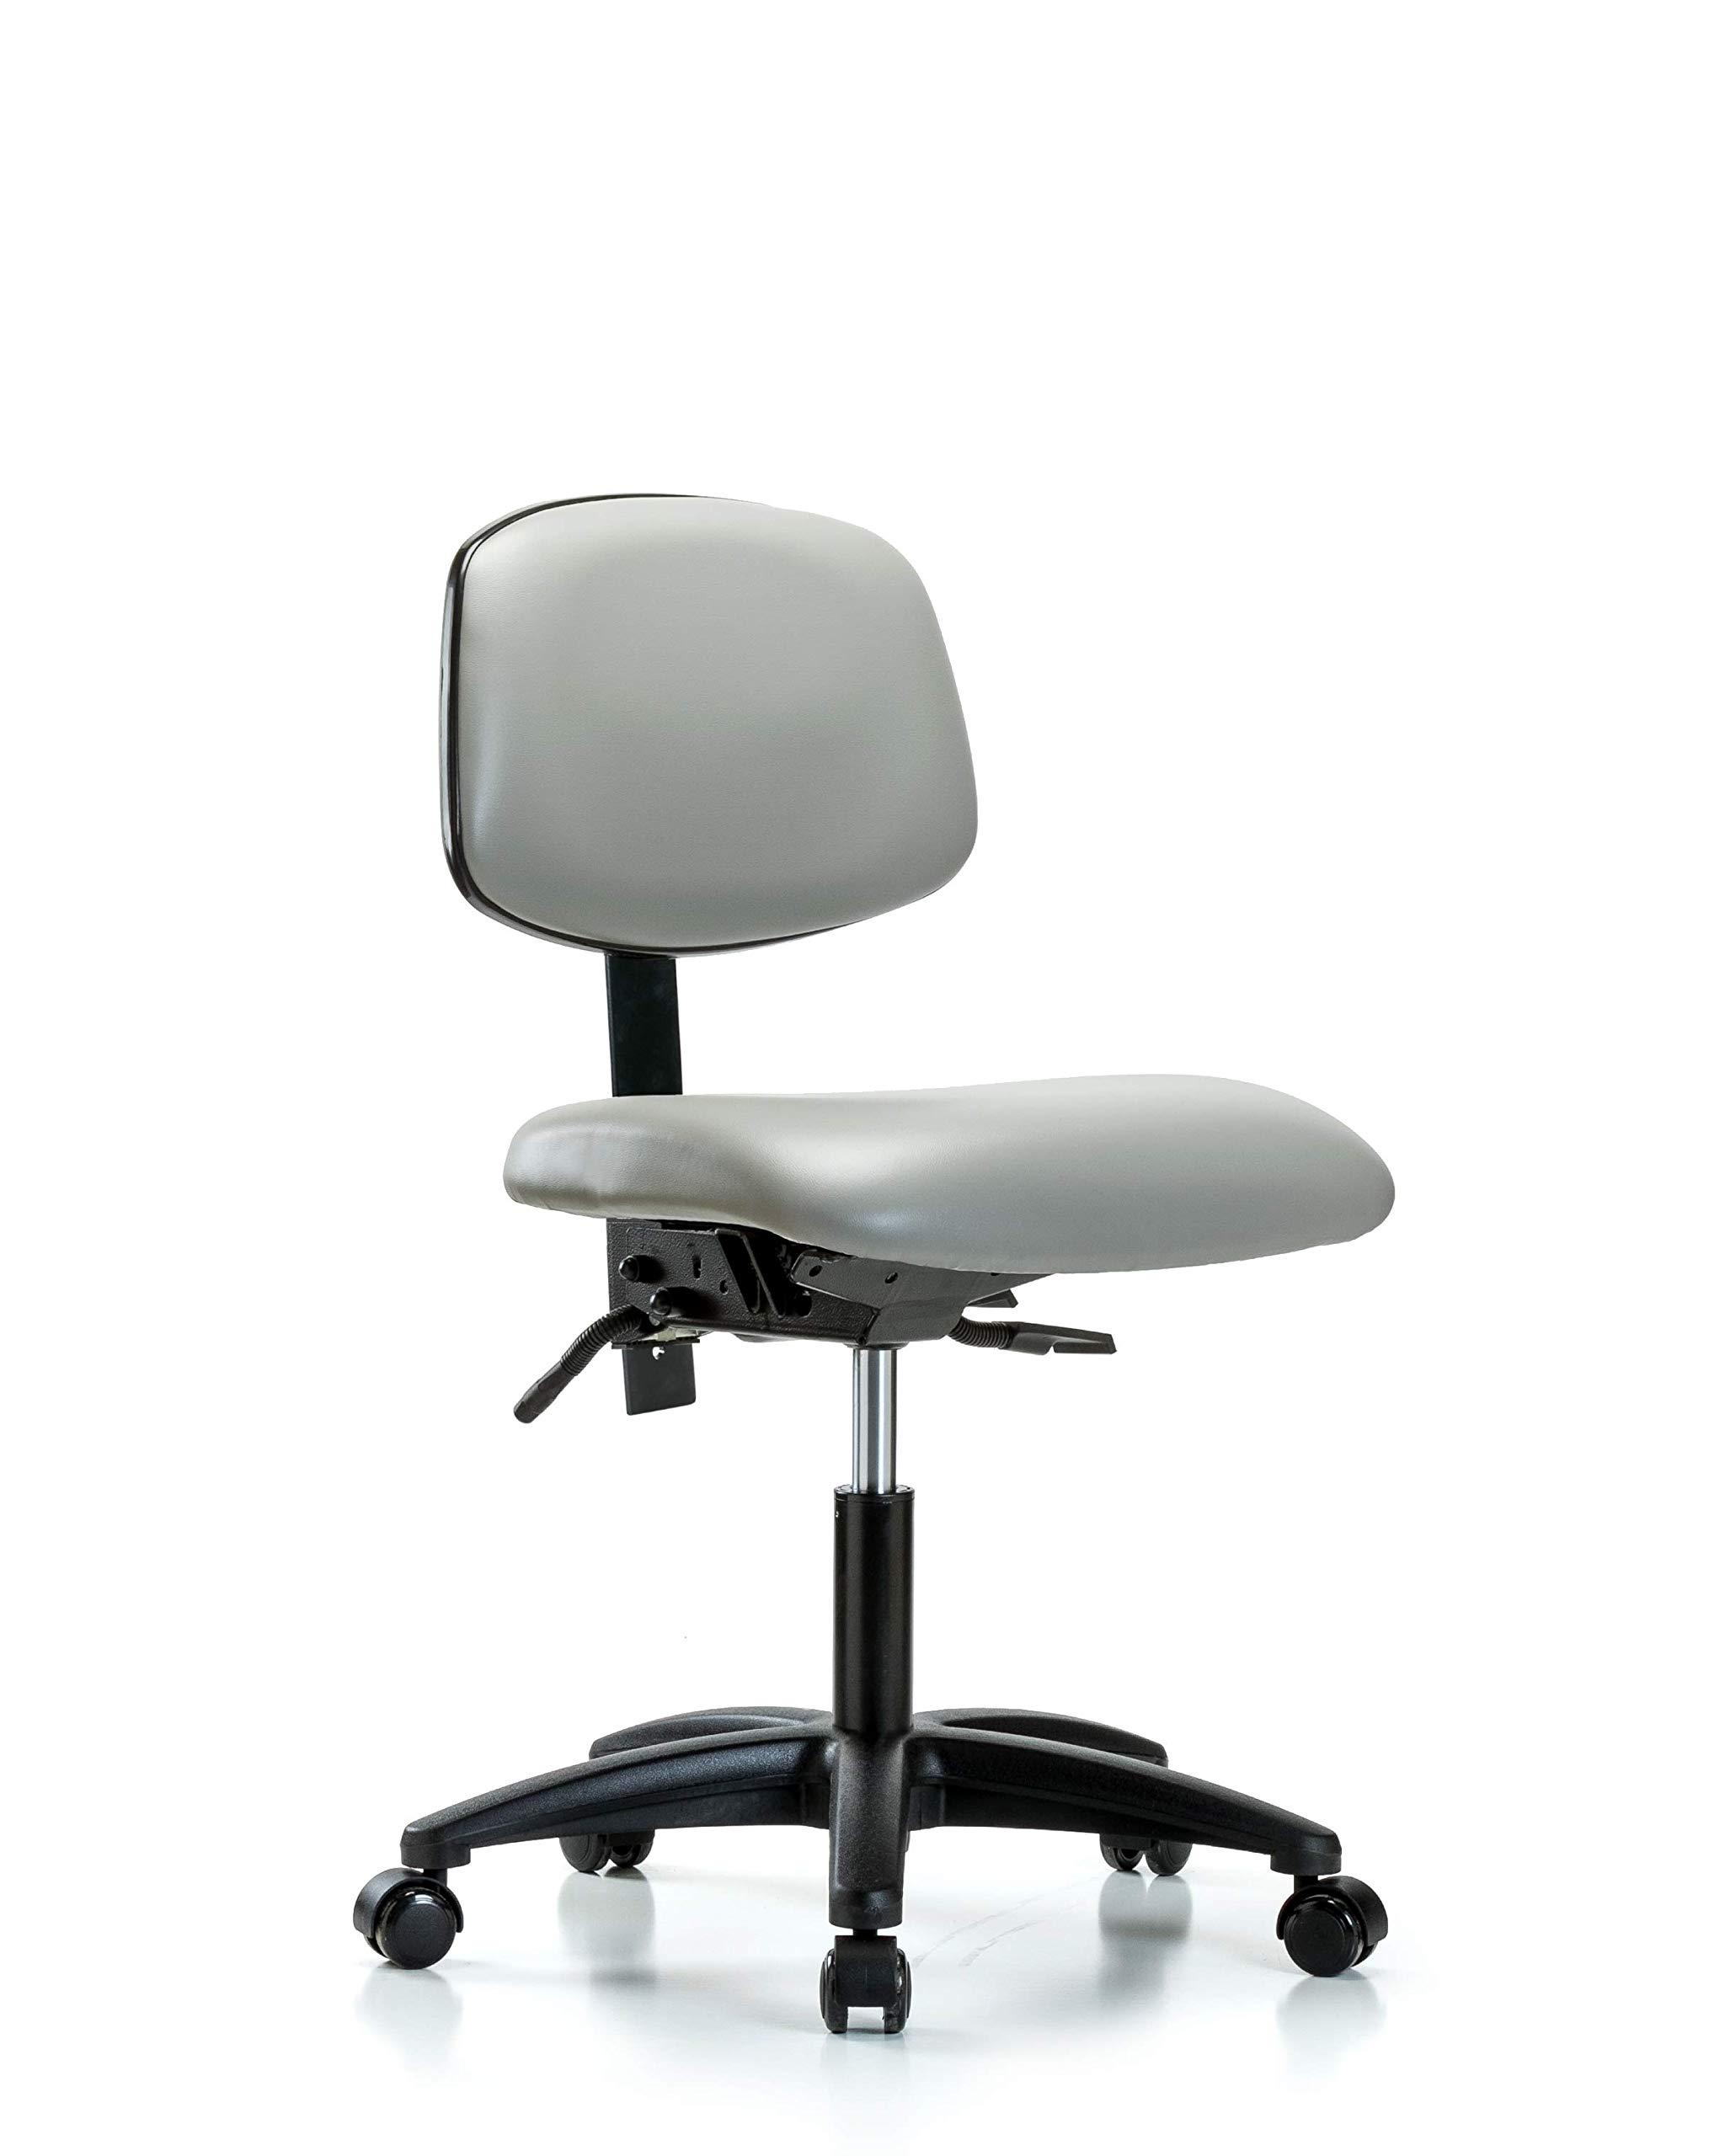 LabTech Seating LT44213 Desk Height Chair, Vinyl, Nylon Base - Casters, Dove